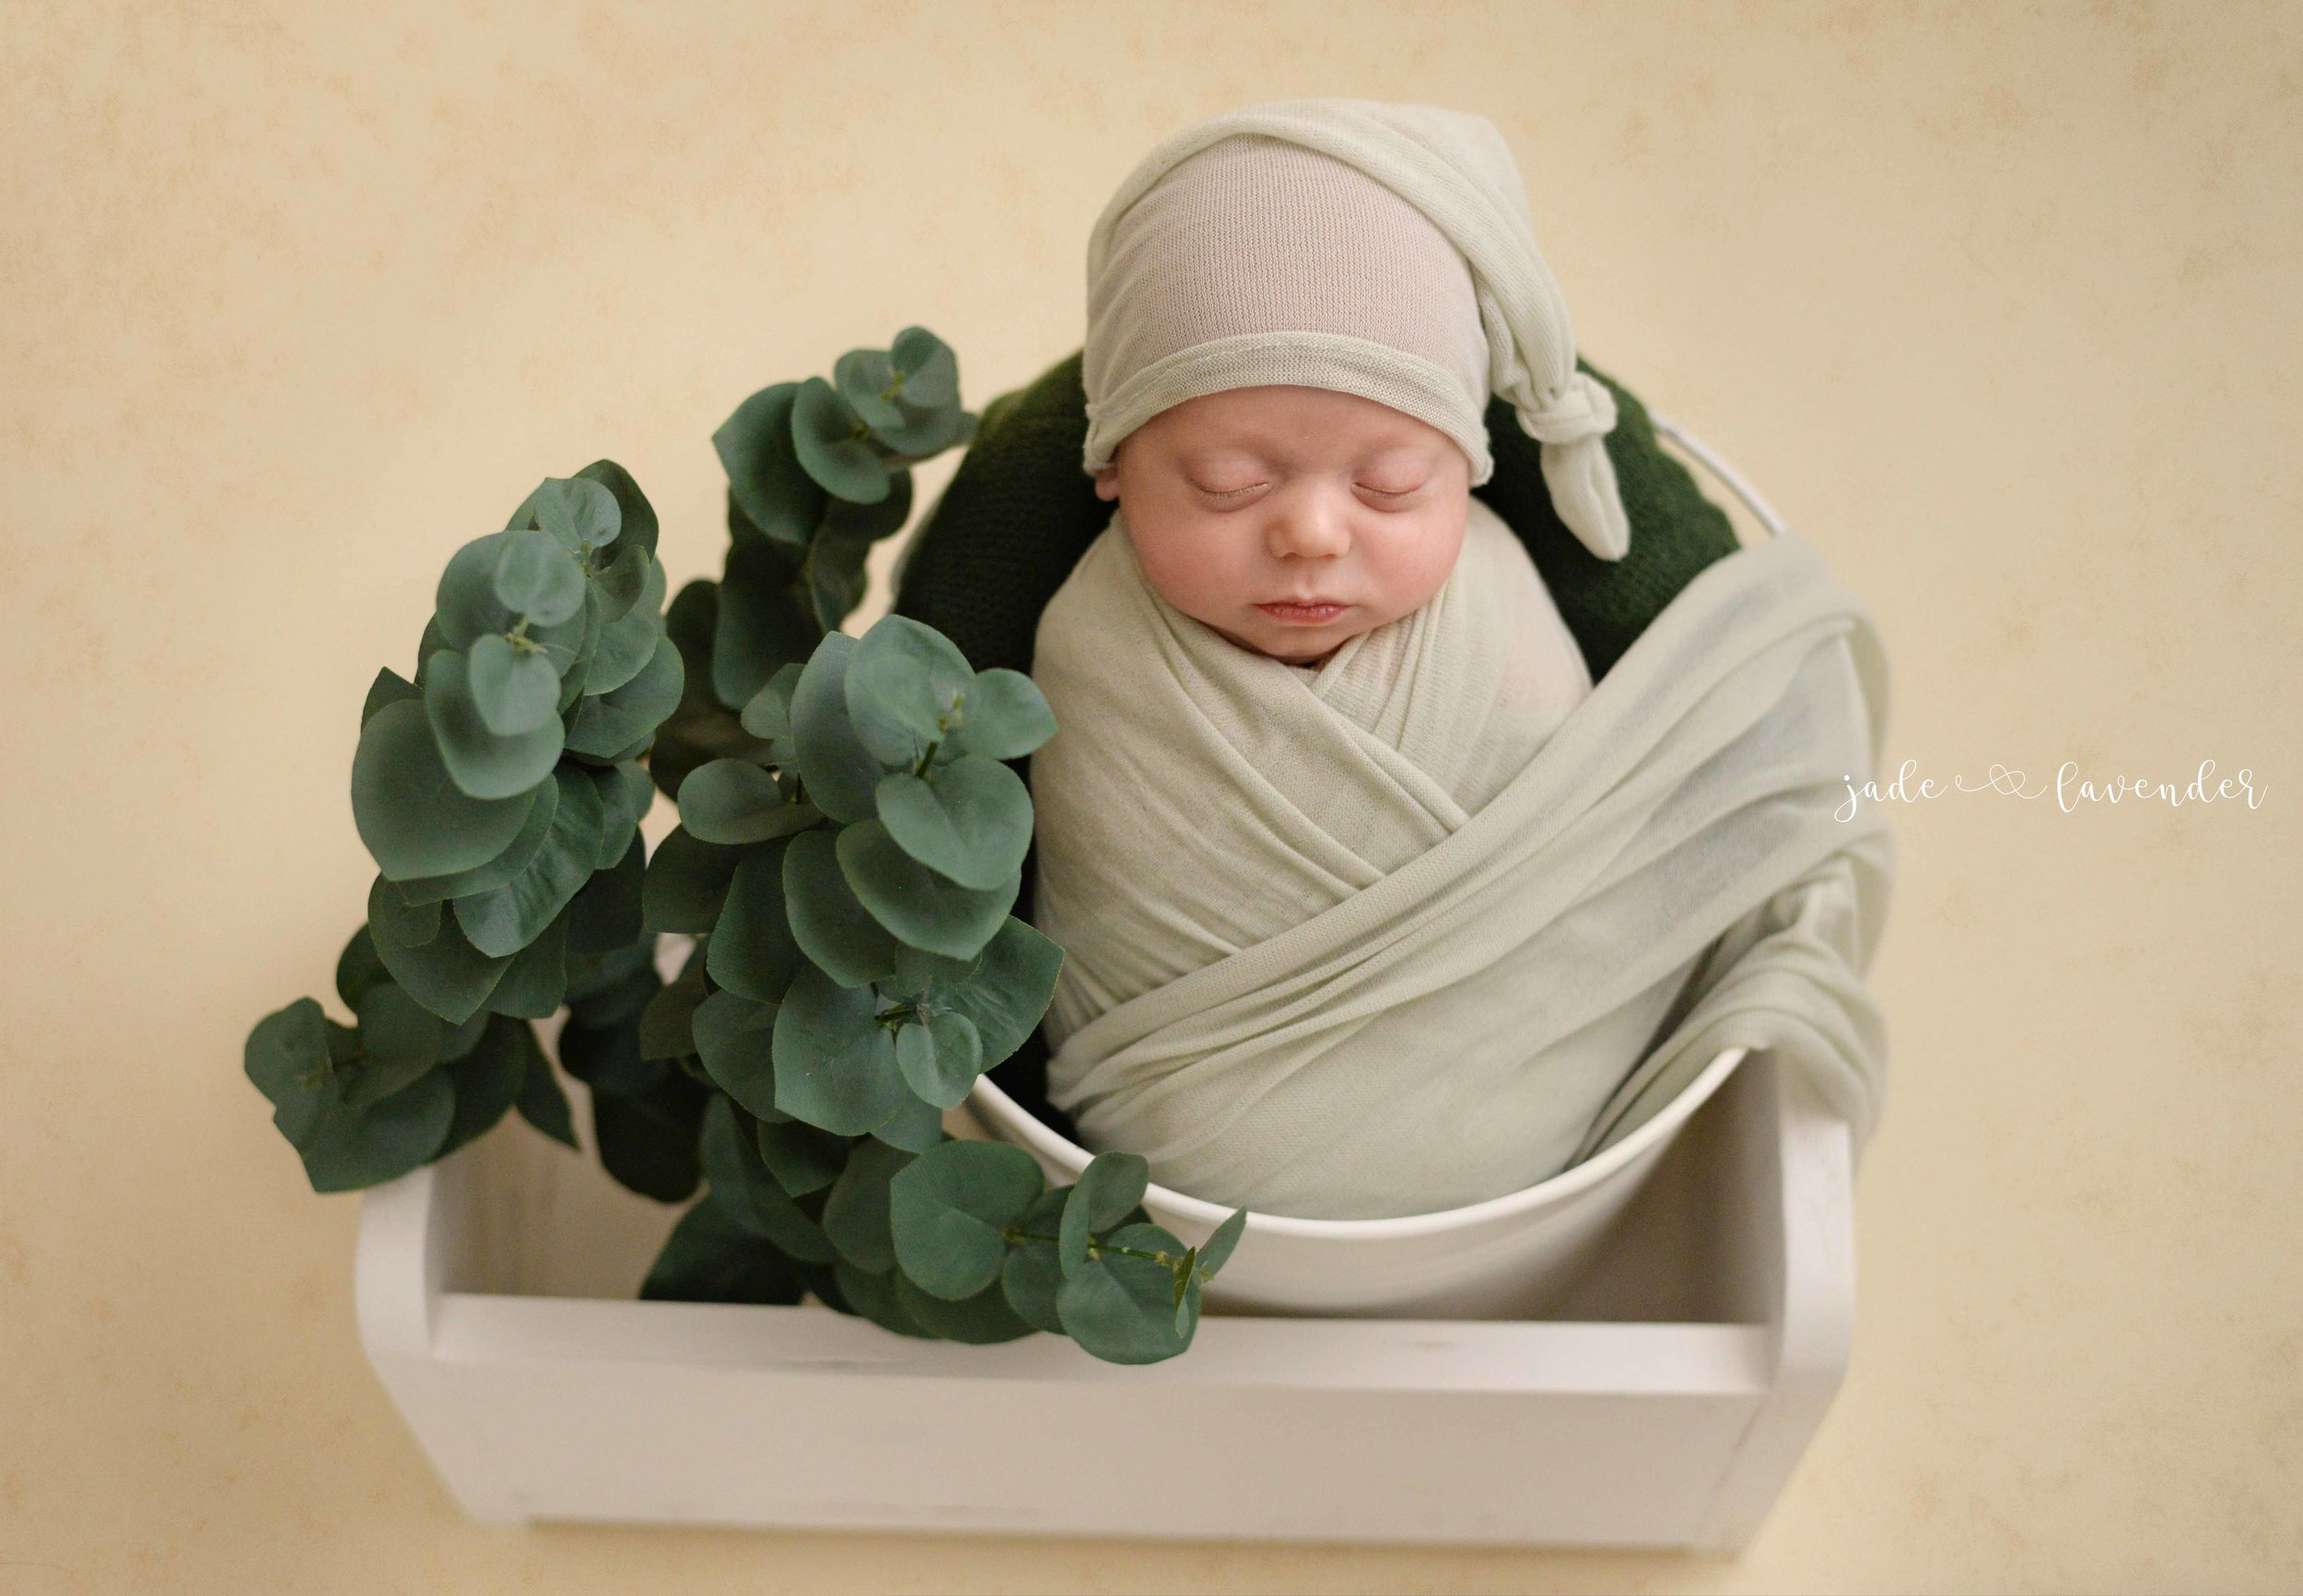 newborn-images-baby-pictures-cute-infant-spokane-washington.jpg